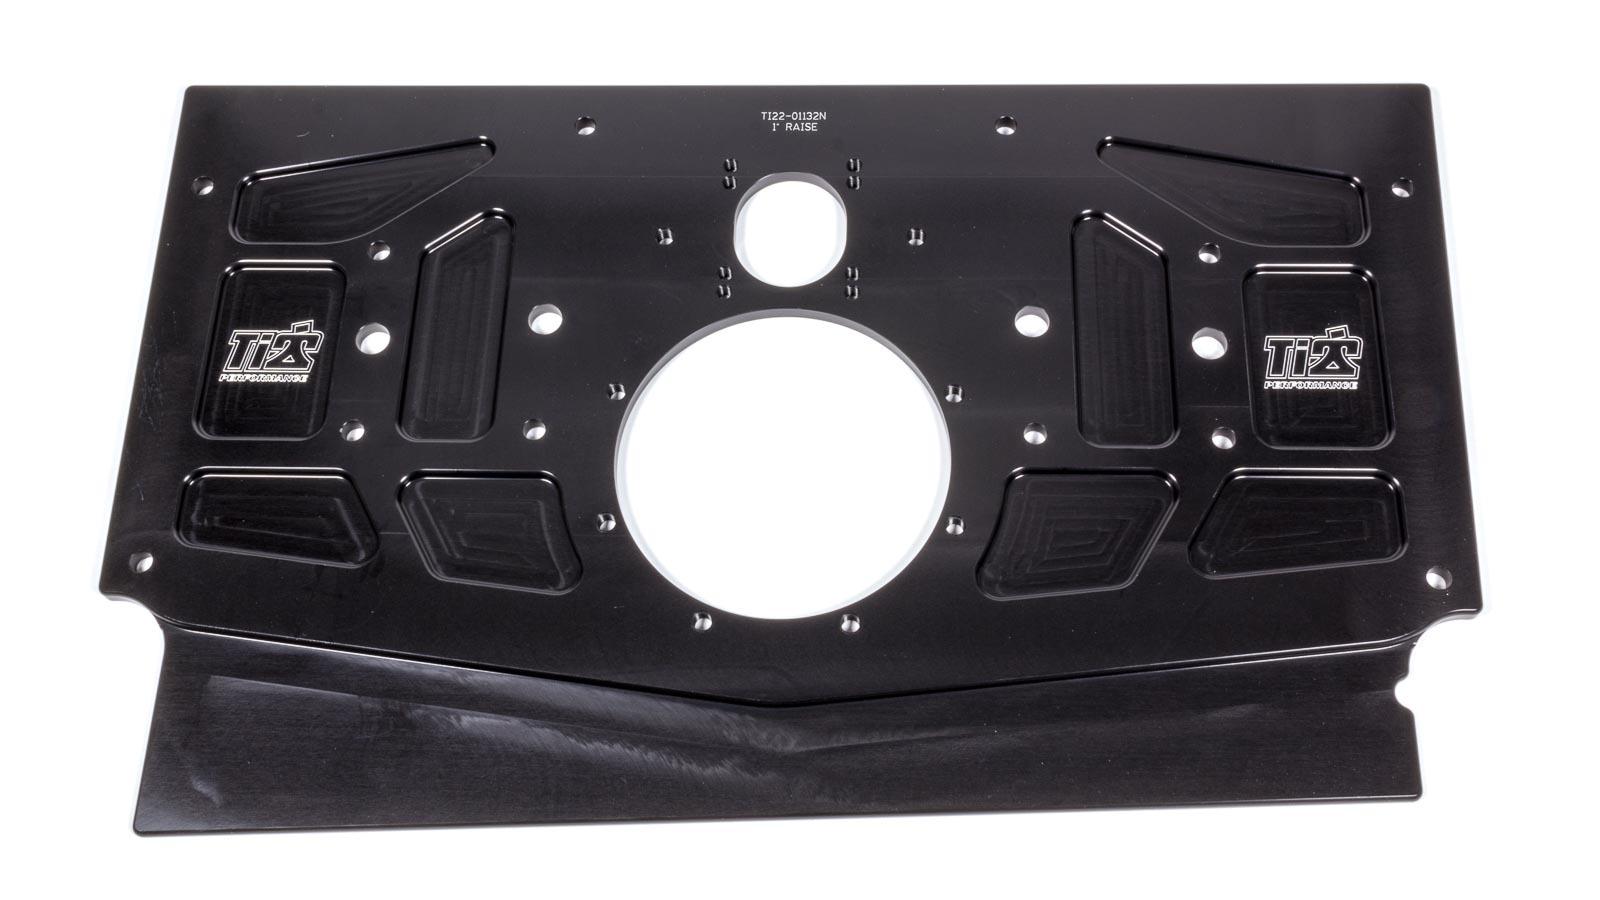 Ti22 Performance 5000 Motor Plate, Rear, 24-5/8 x 12-7/16 x 3/8 in, Aluminum, Black Anodize, Sprint Car, Each